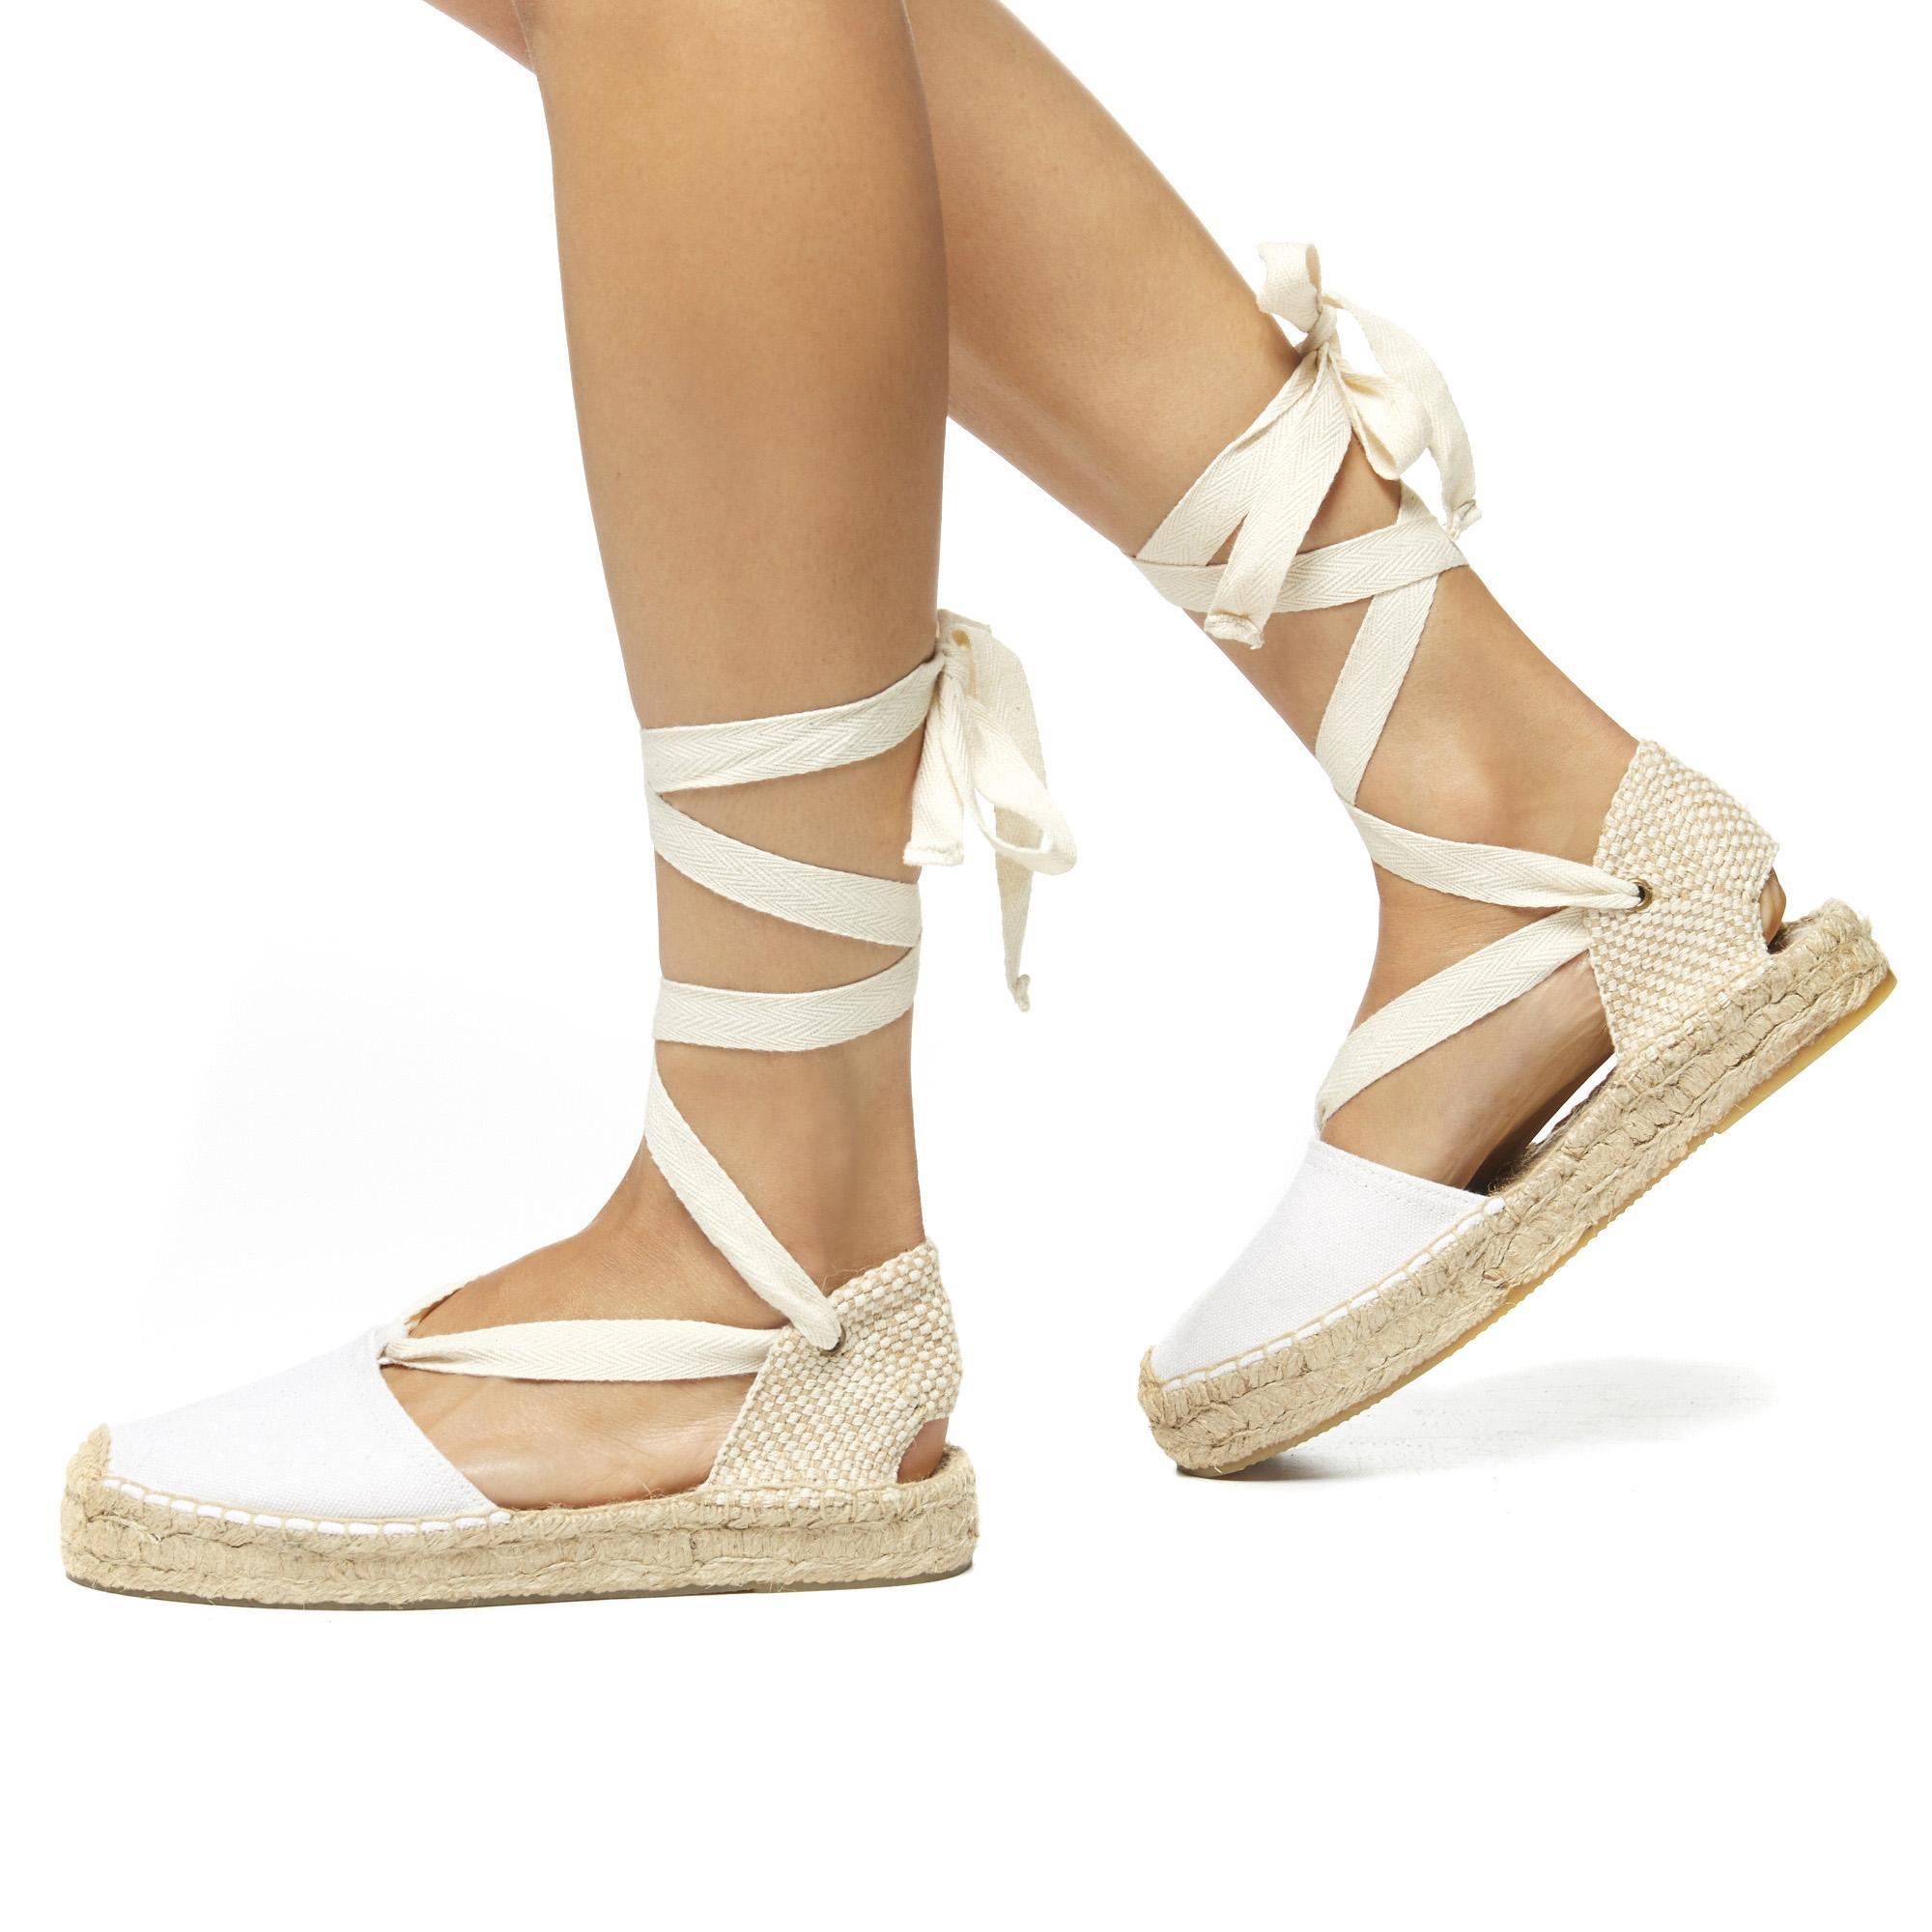 7db787e3cb7 Lyst - Soludos Canvas Platform Gladiator Sandal in White